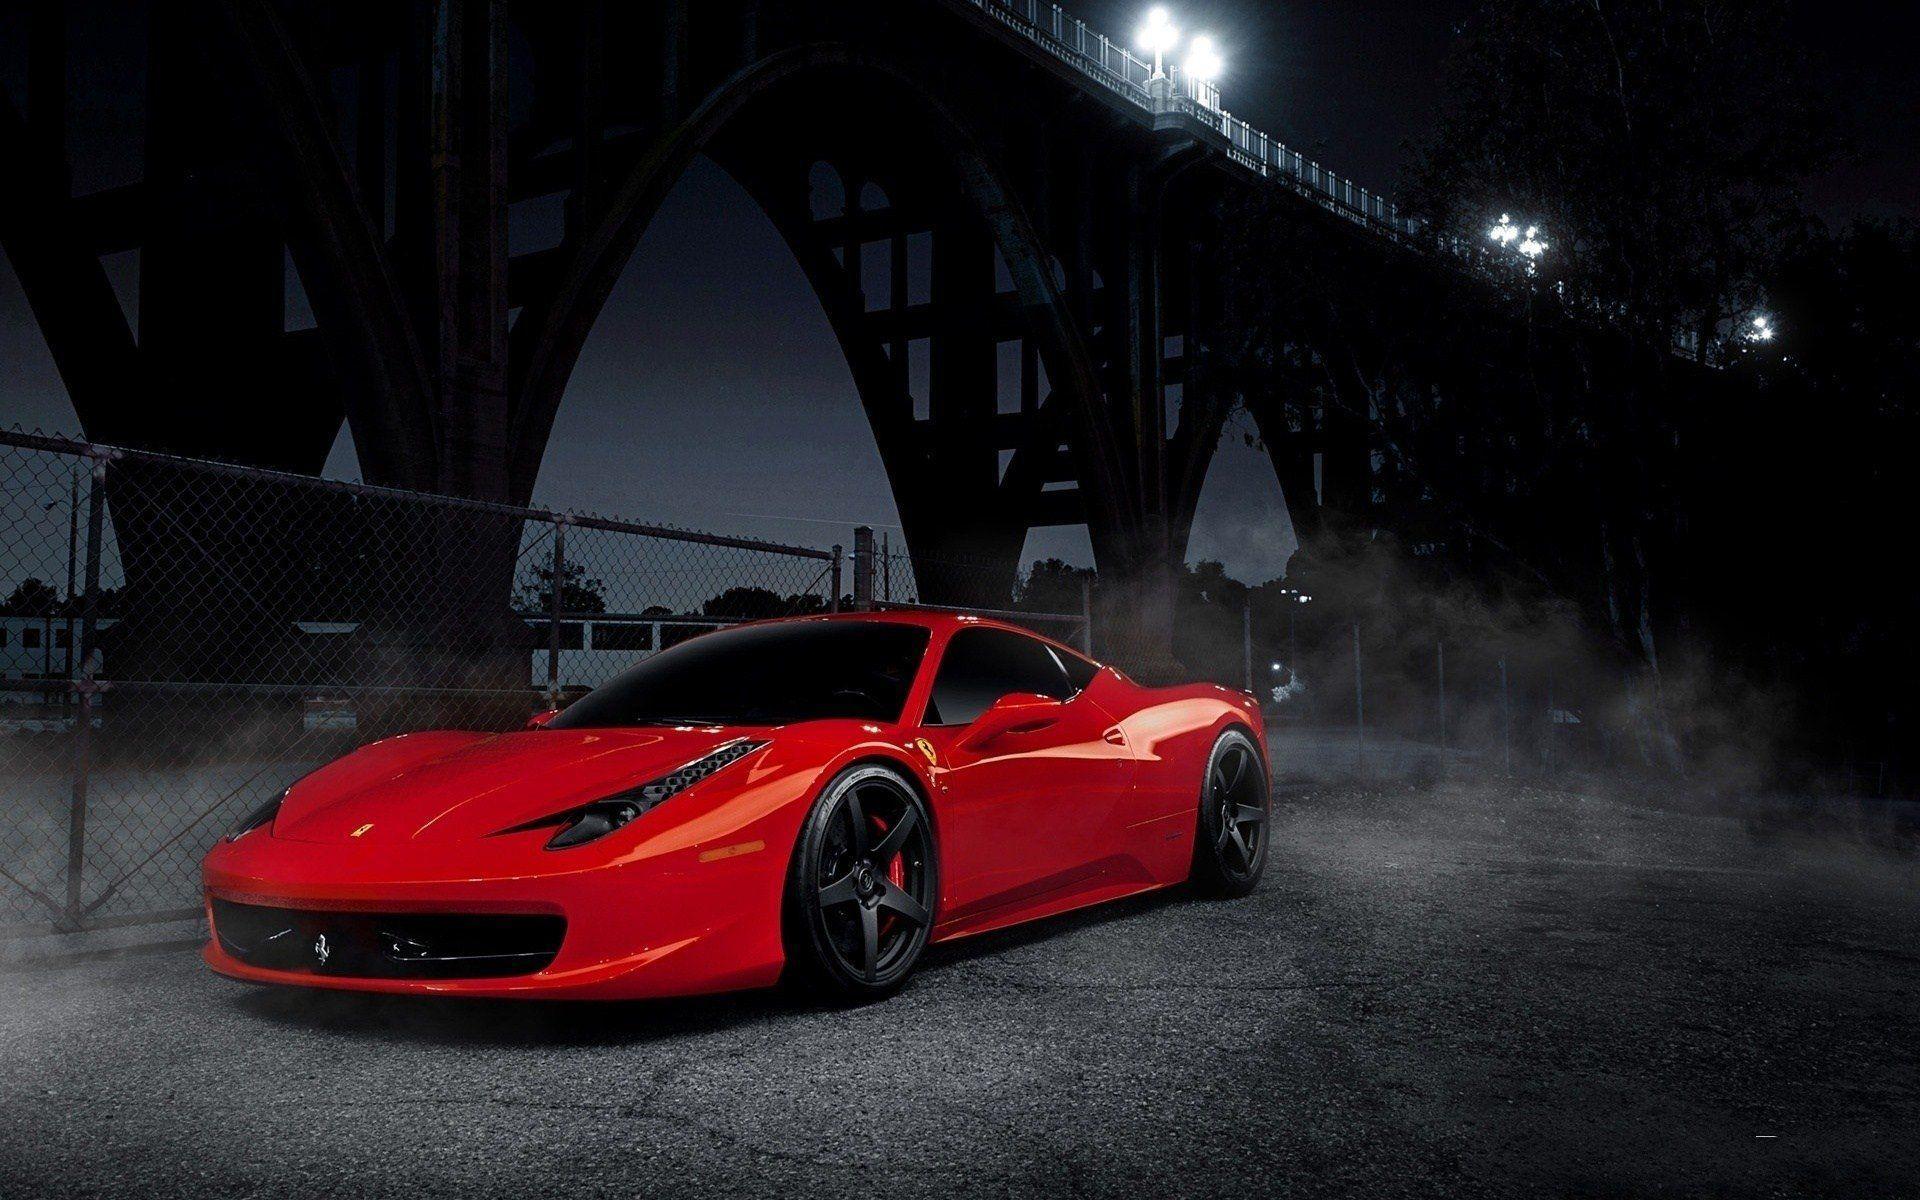 Ferrari 458 Wallpapers Top Free Ferrari 458 Backgrounds